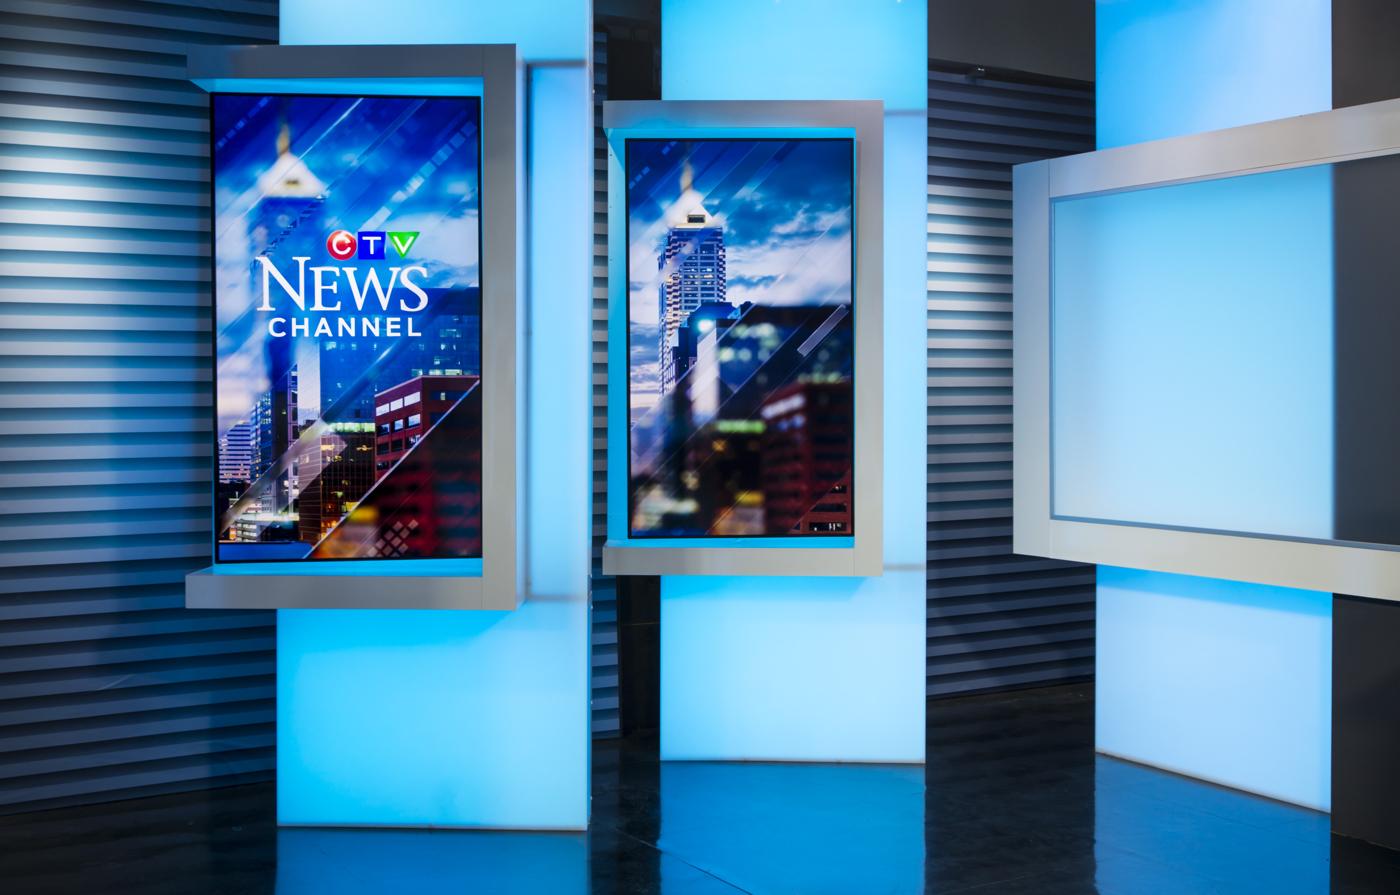 ncs_ctv-news-network-studio-toronto_0008